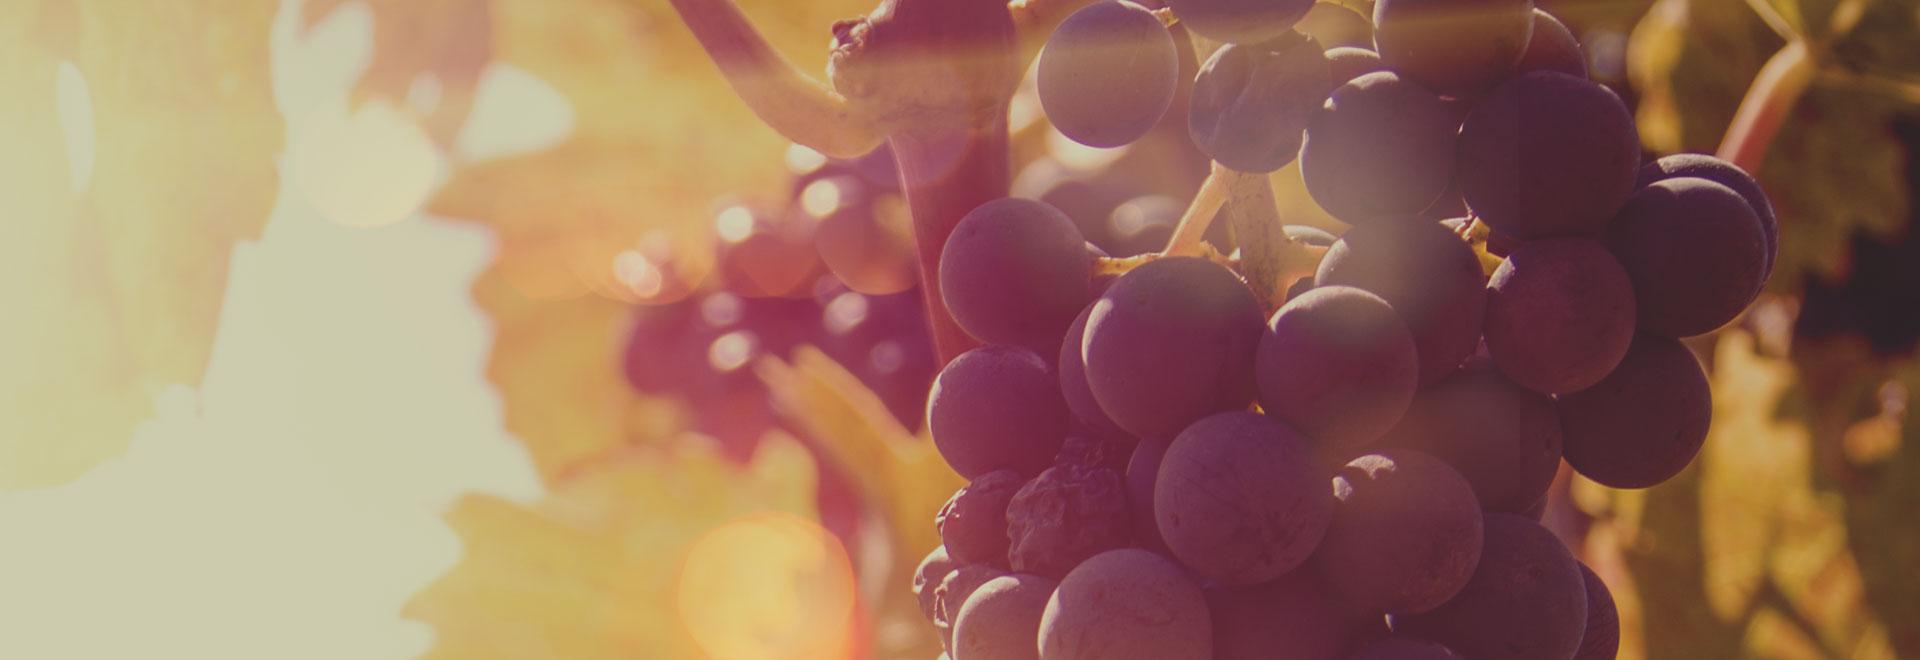 Bottega del Vino Serralunga D'Alba